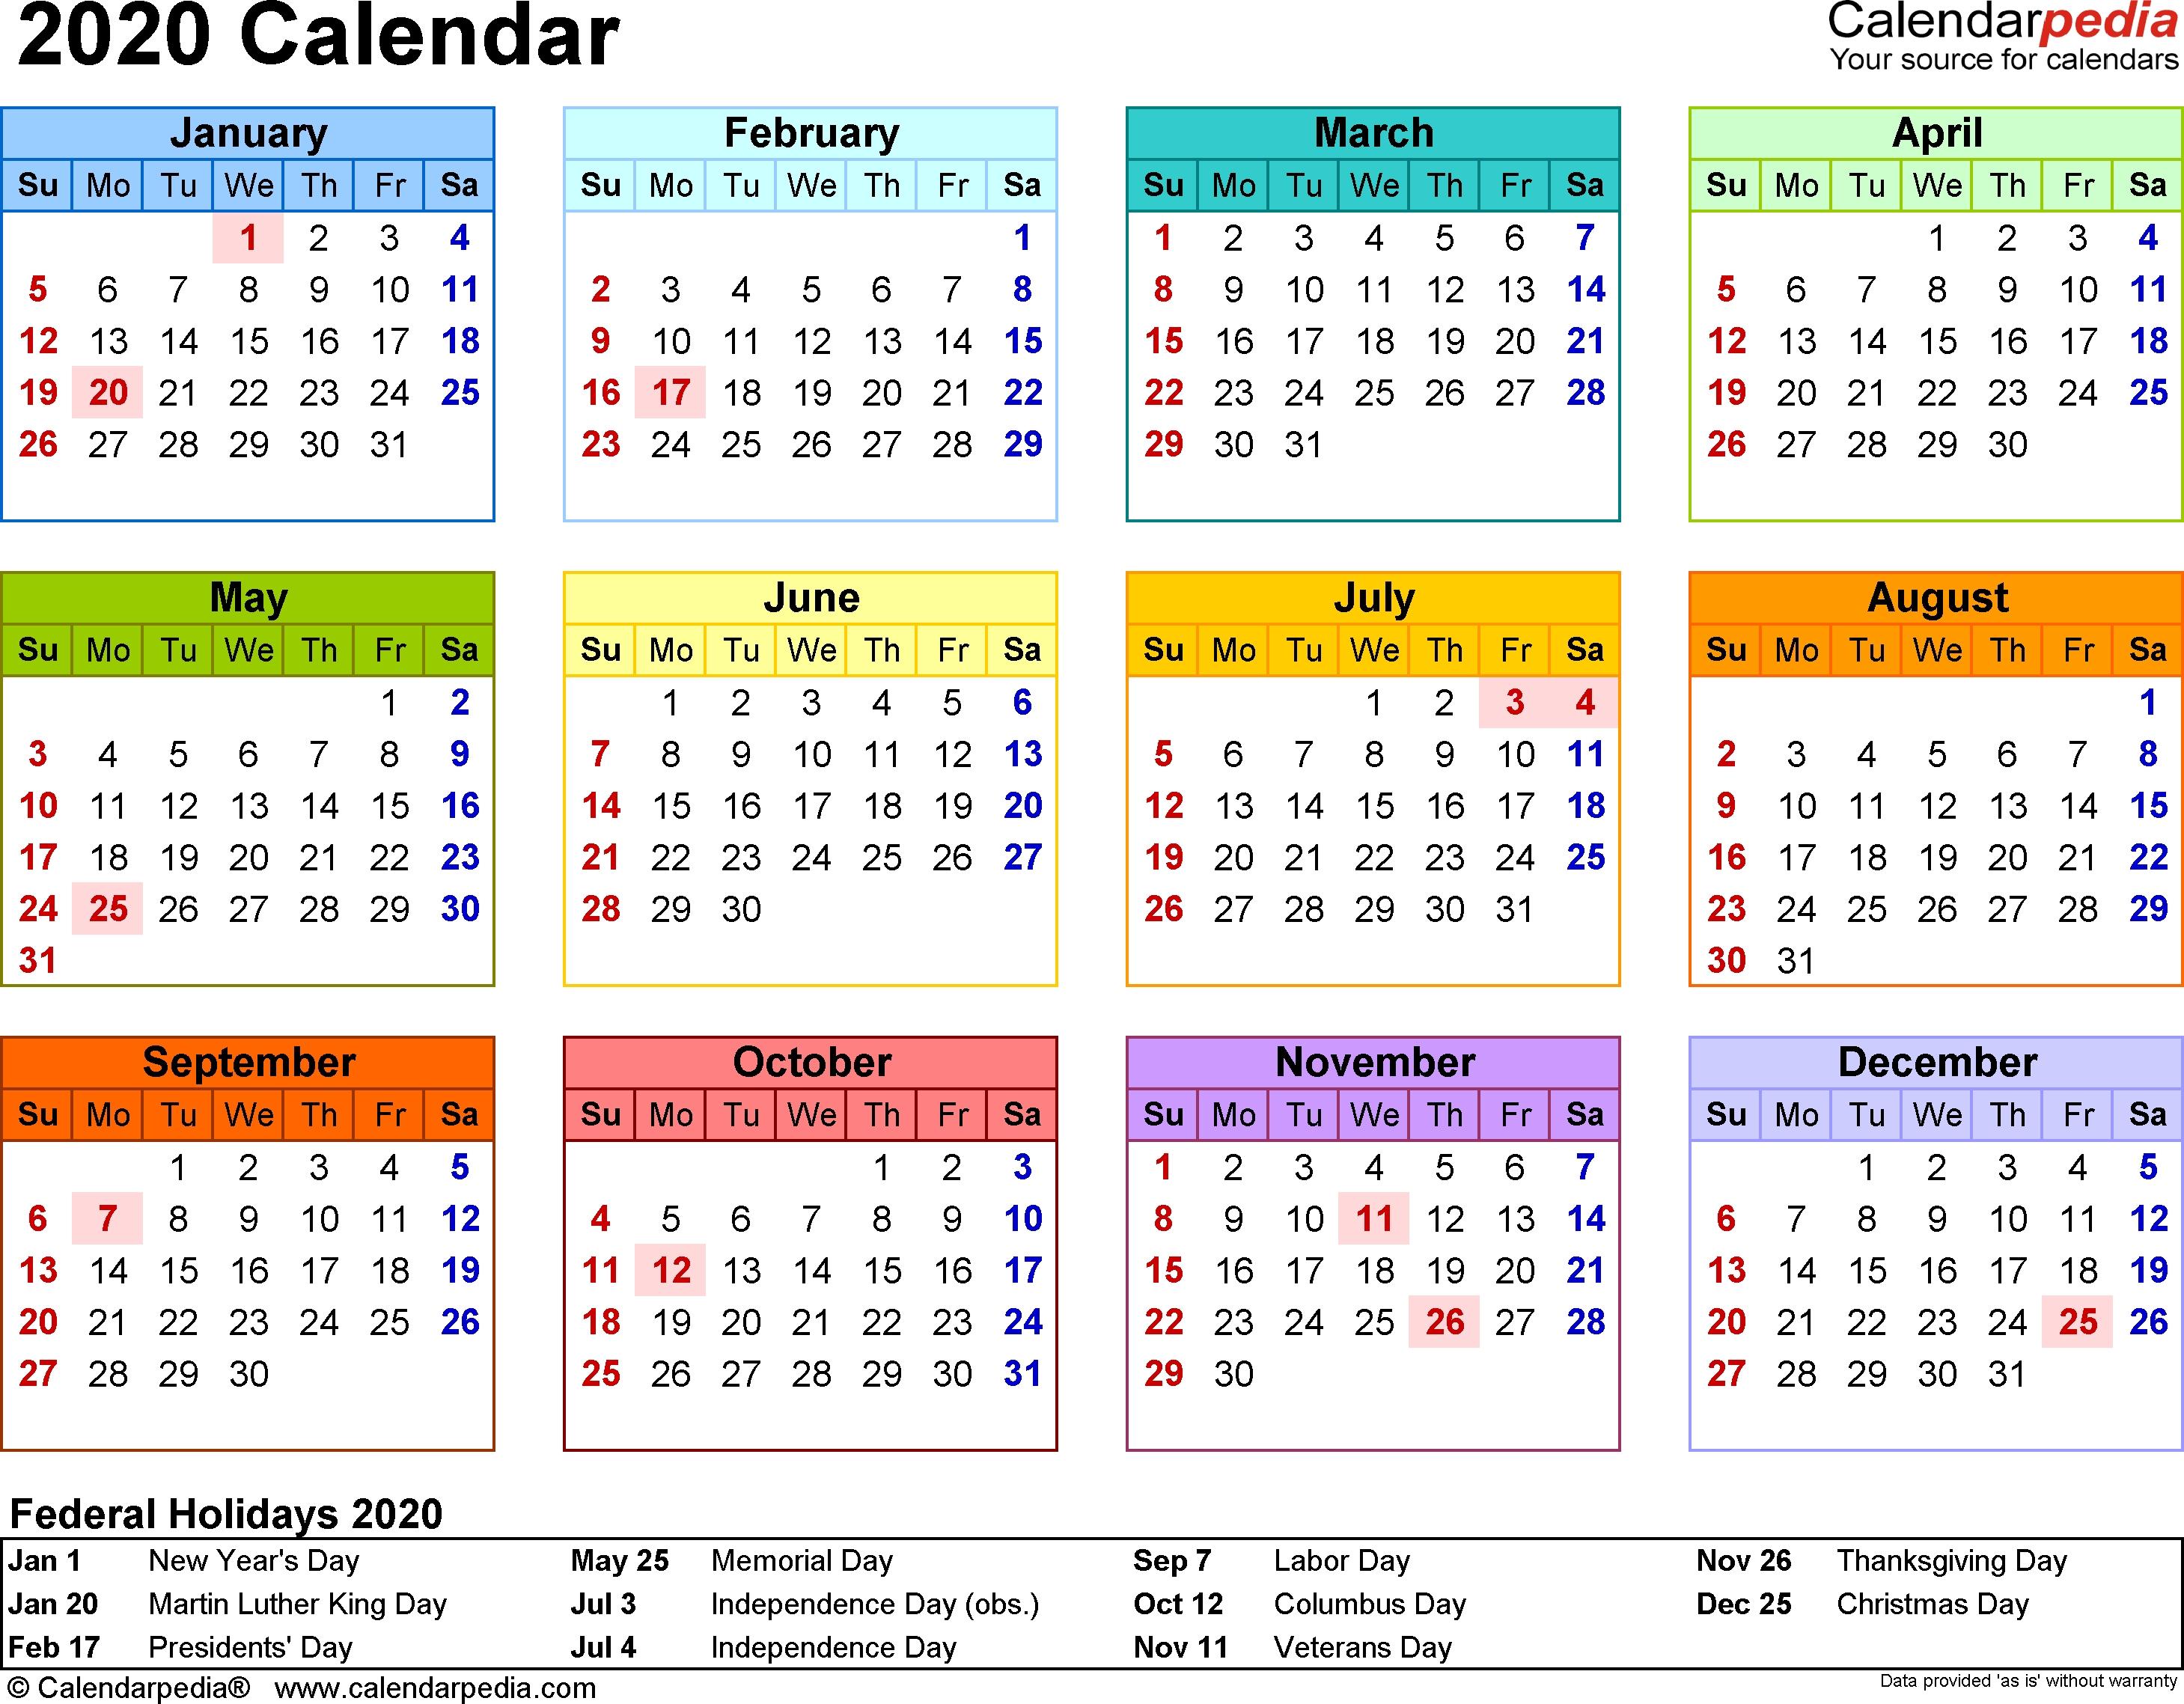 2020 Calendar - Download 17 Free Printable Excel Templates (.xlsx) Exceptional 2020 Calendar India Festival